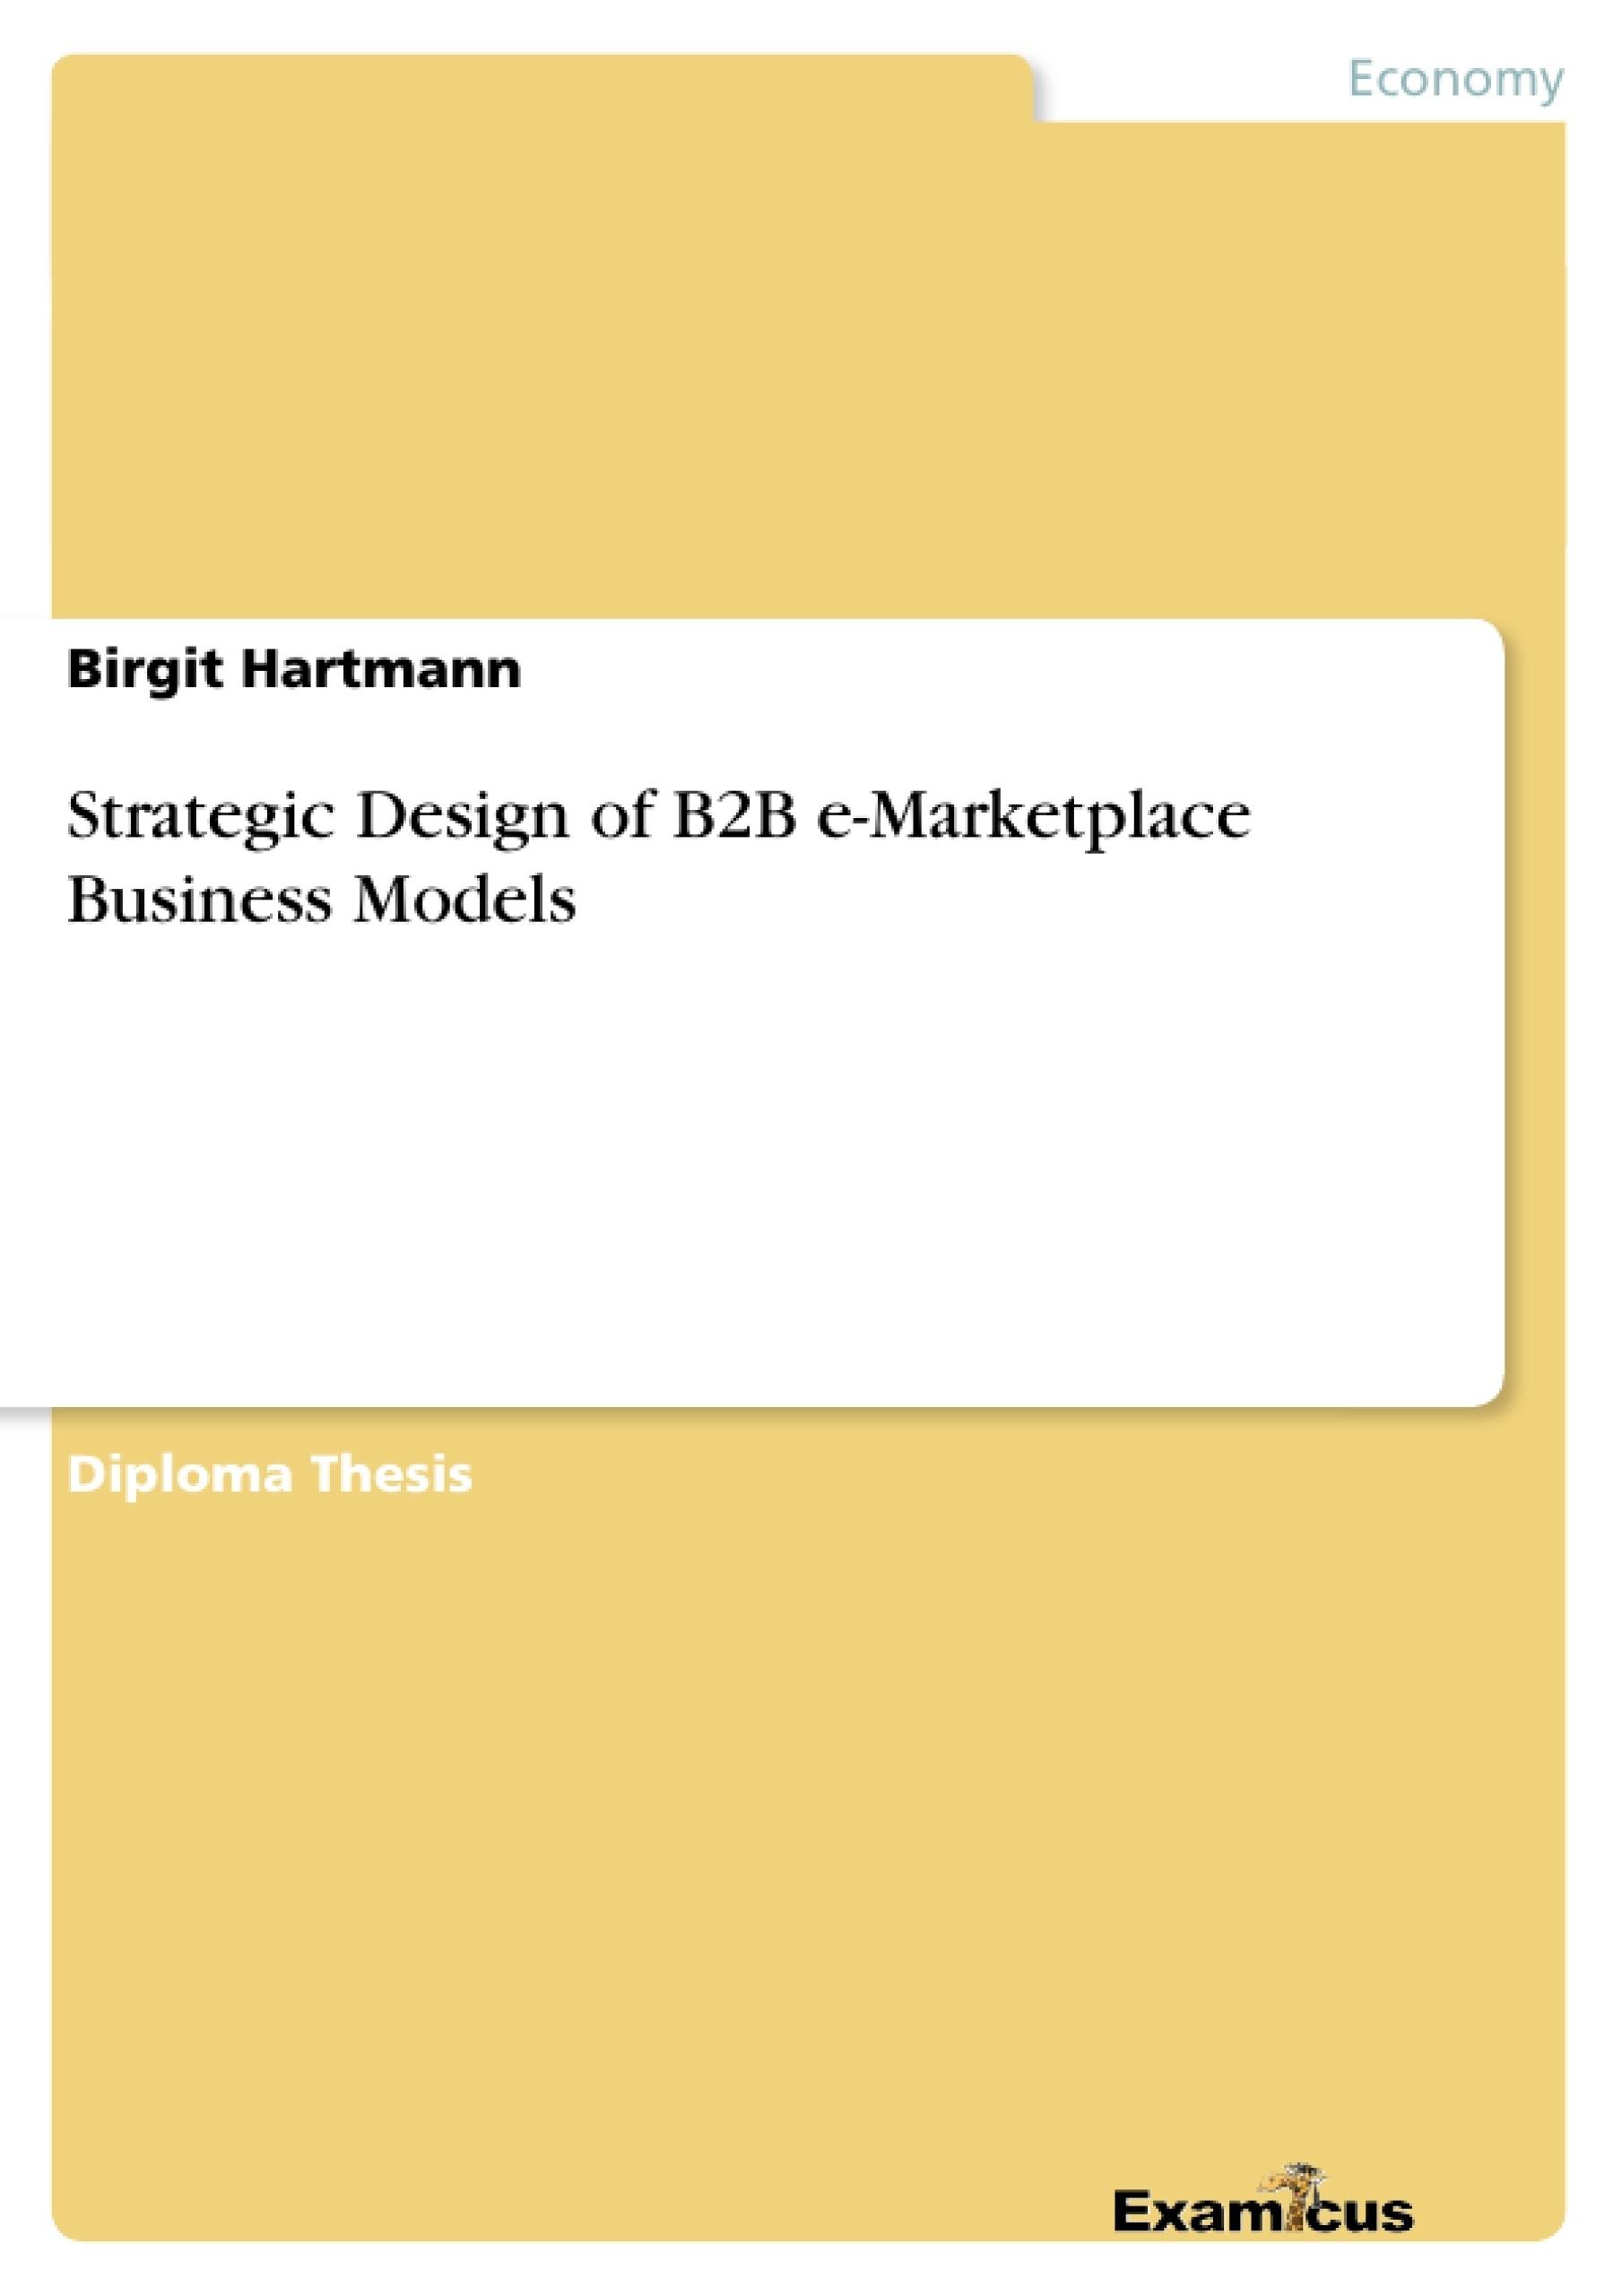 Title: Strategic Design of B2B e-Marketplace Business Models